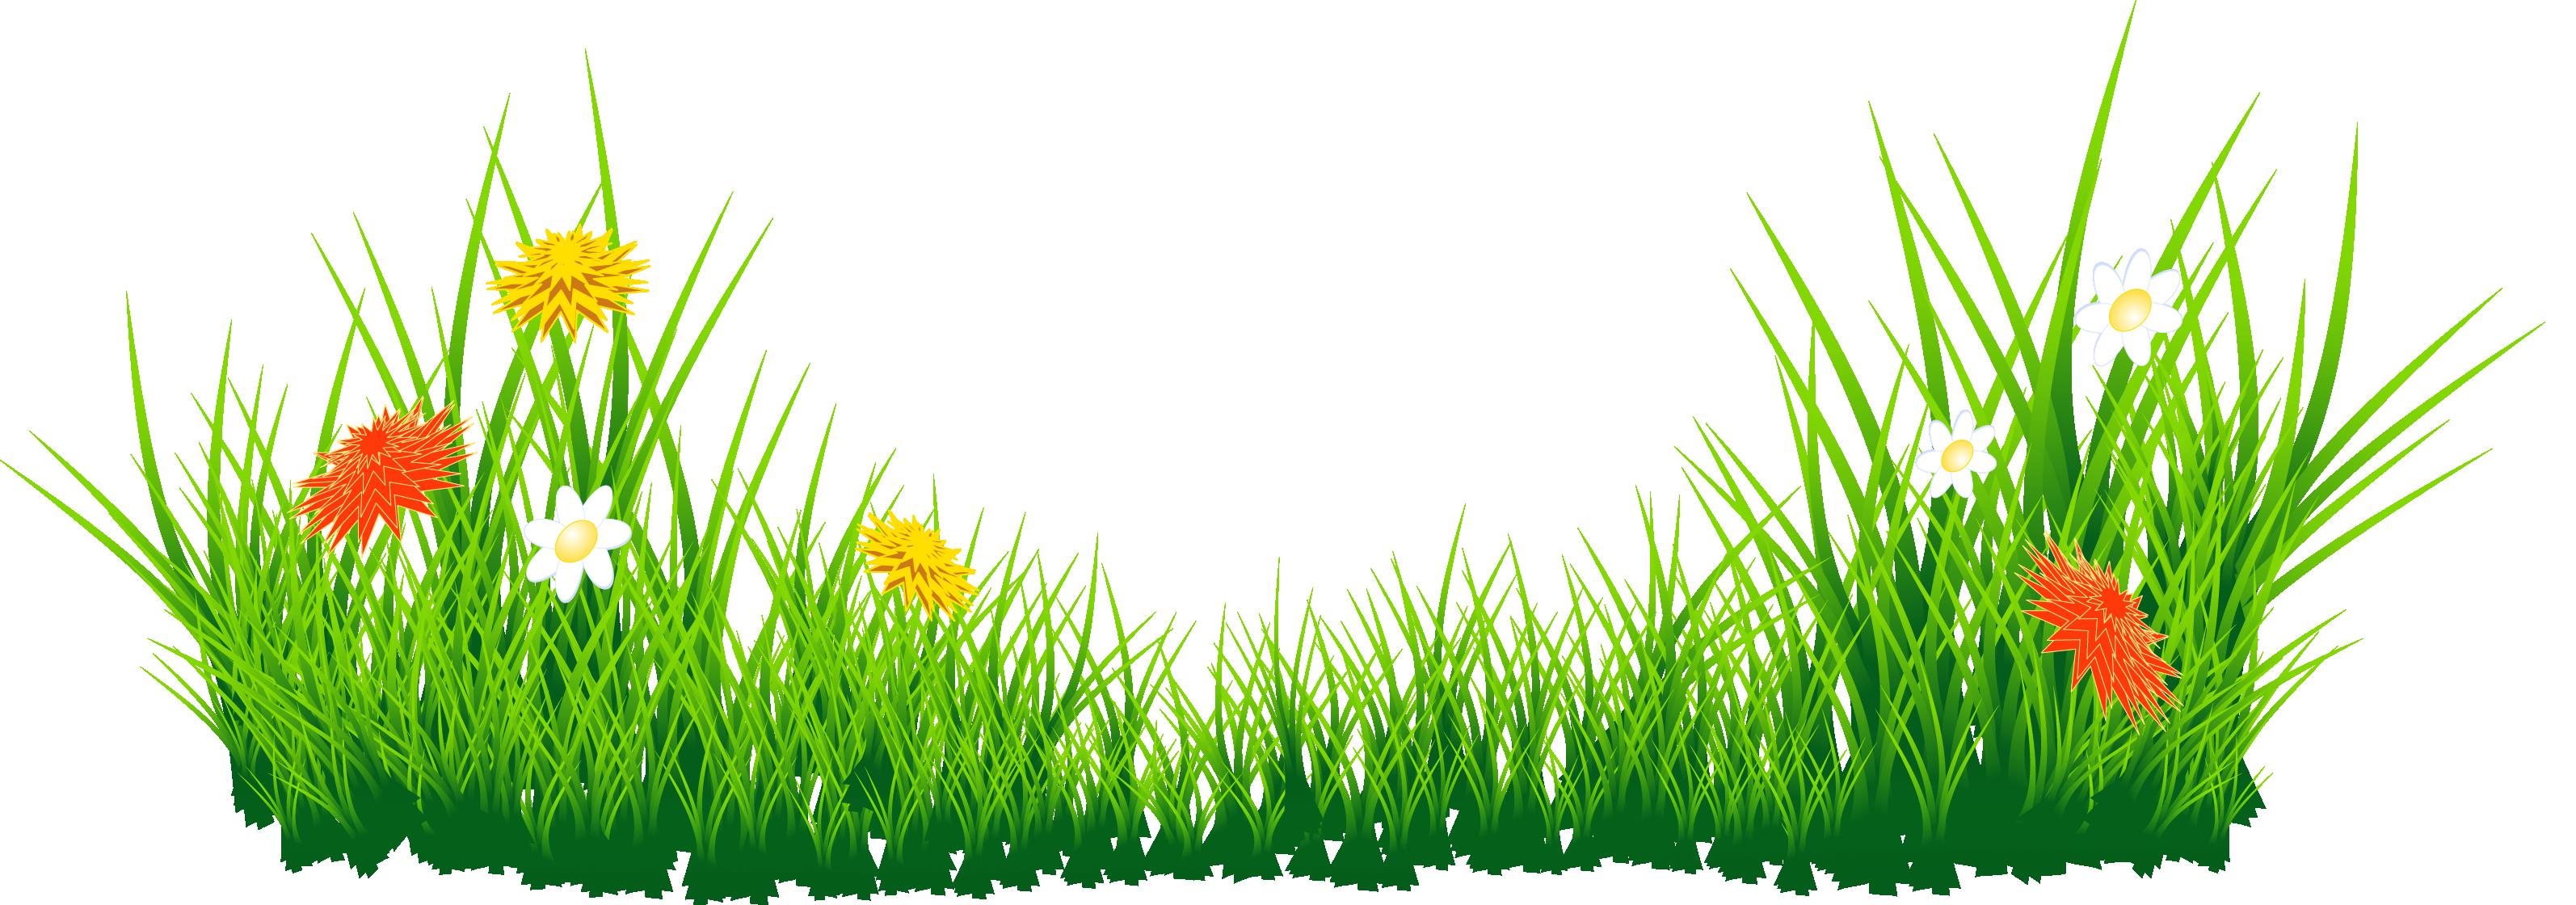 Grass HD PNG - 119869